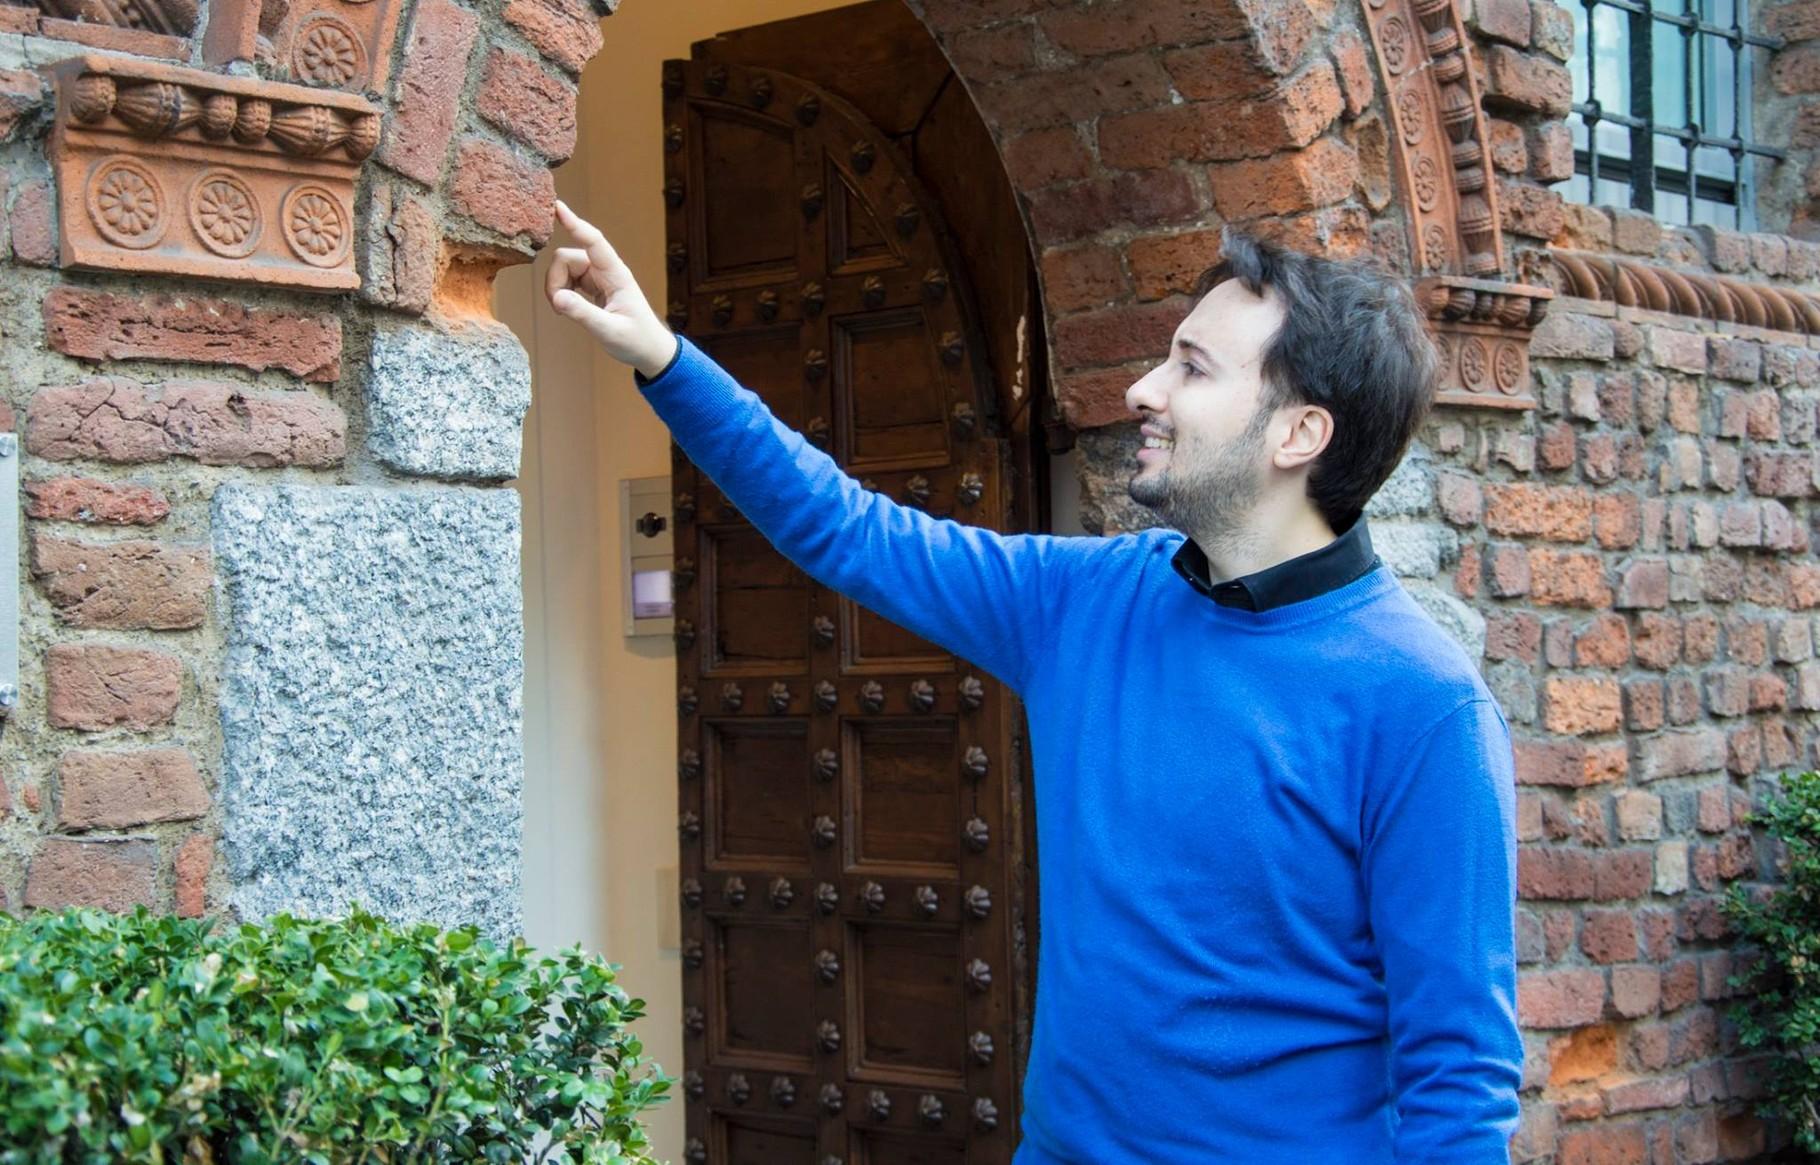 (c) Roberto Pini, 2015